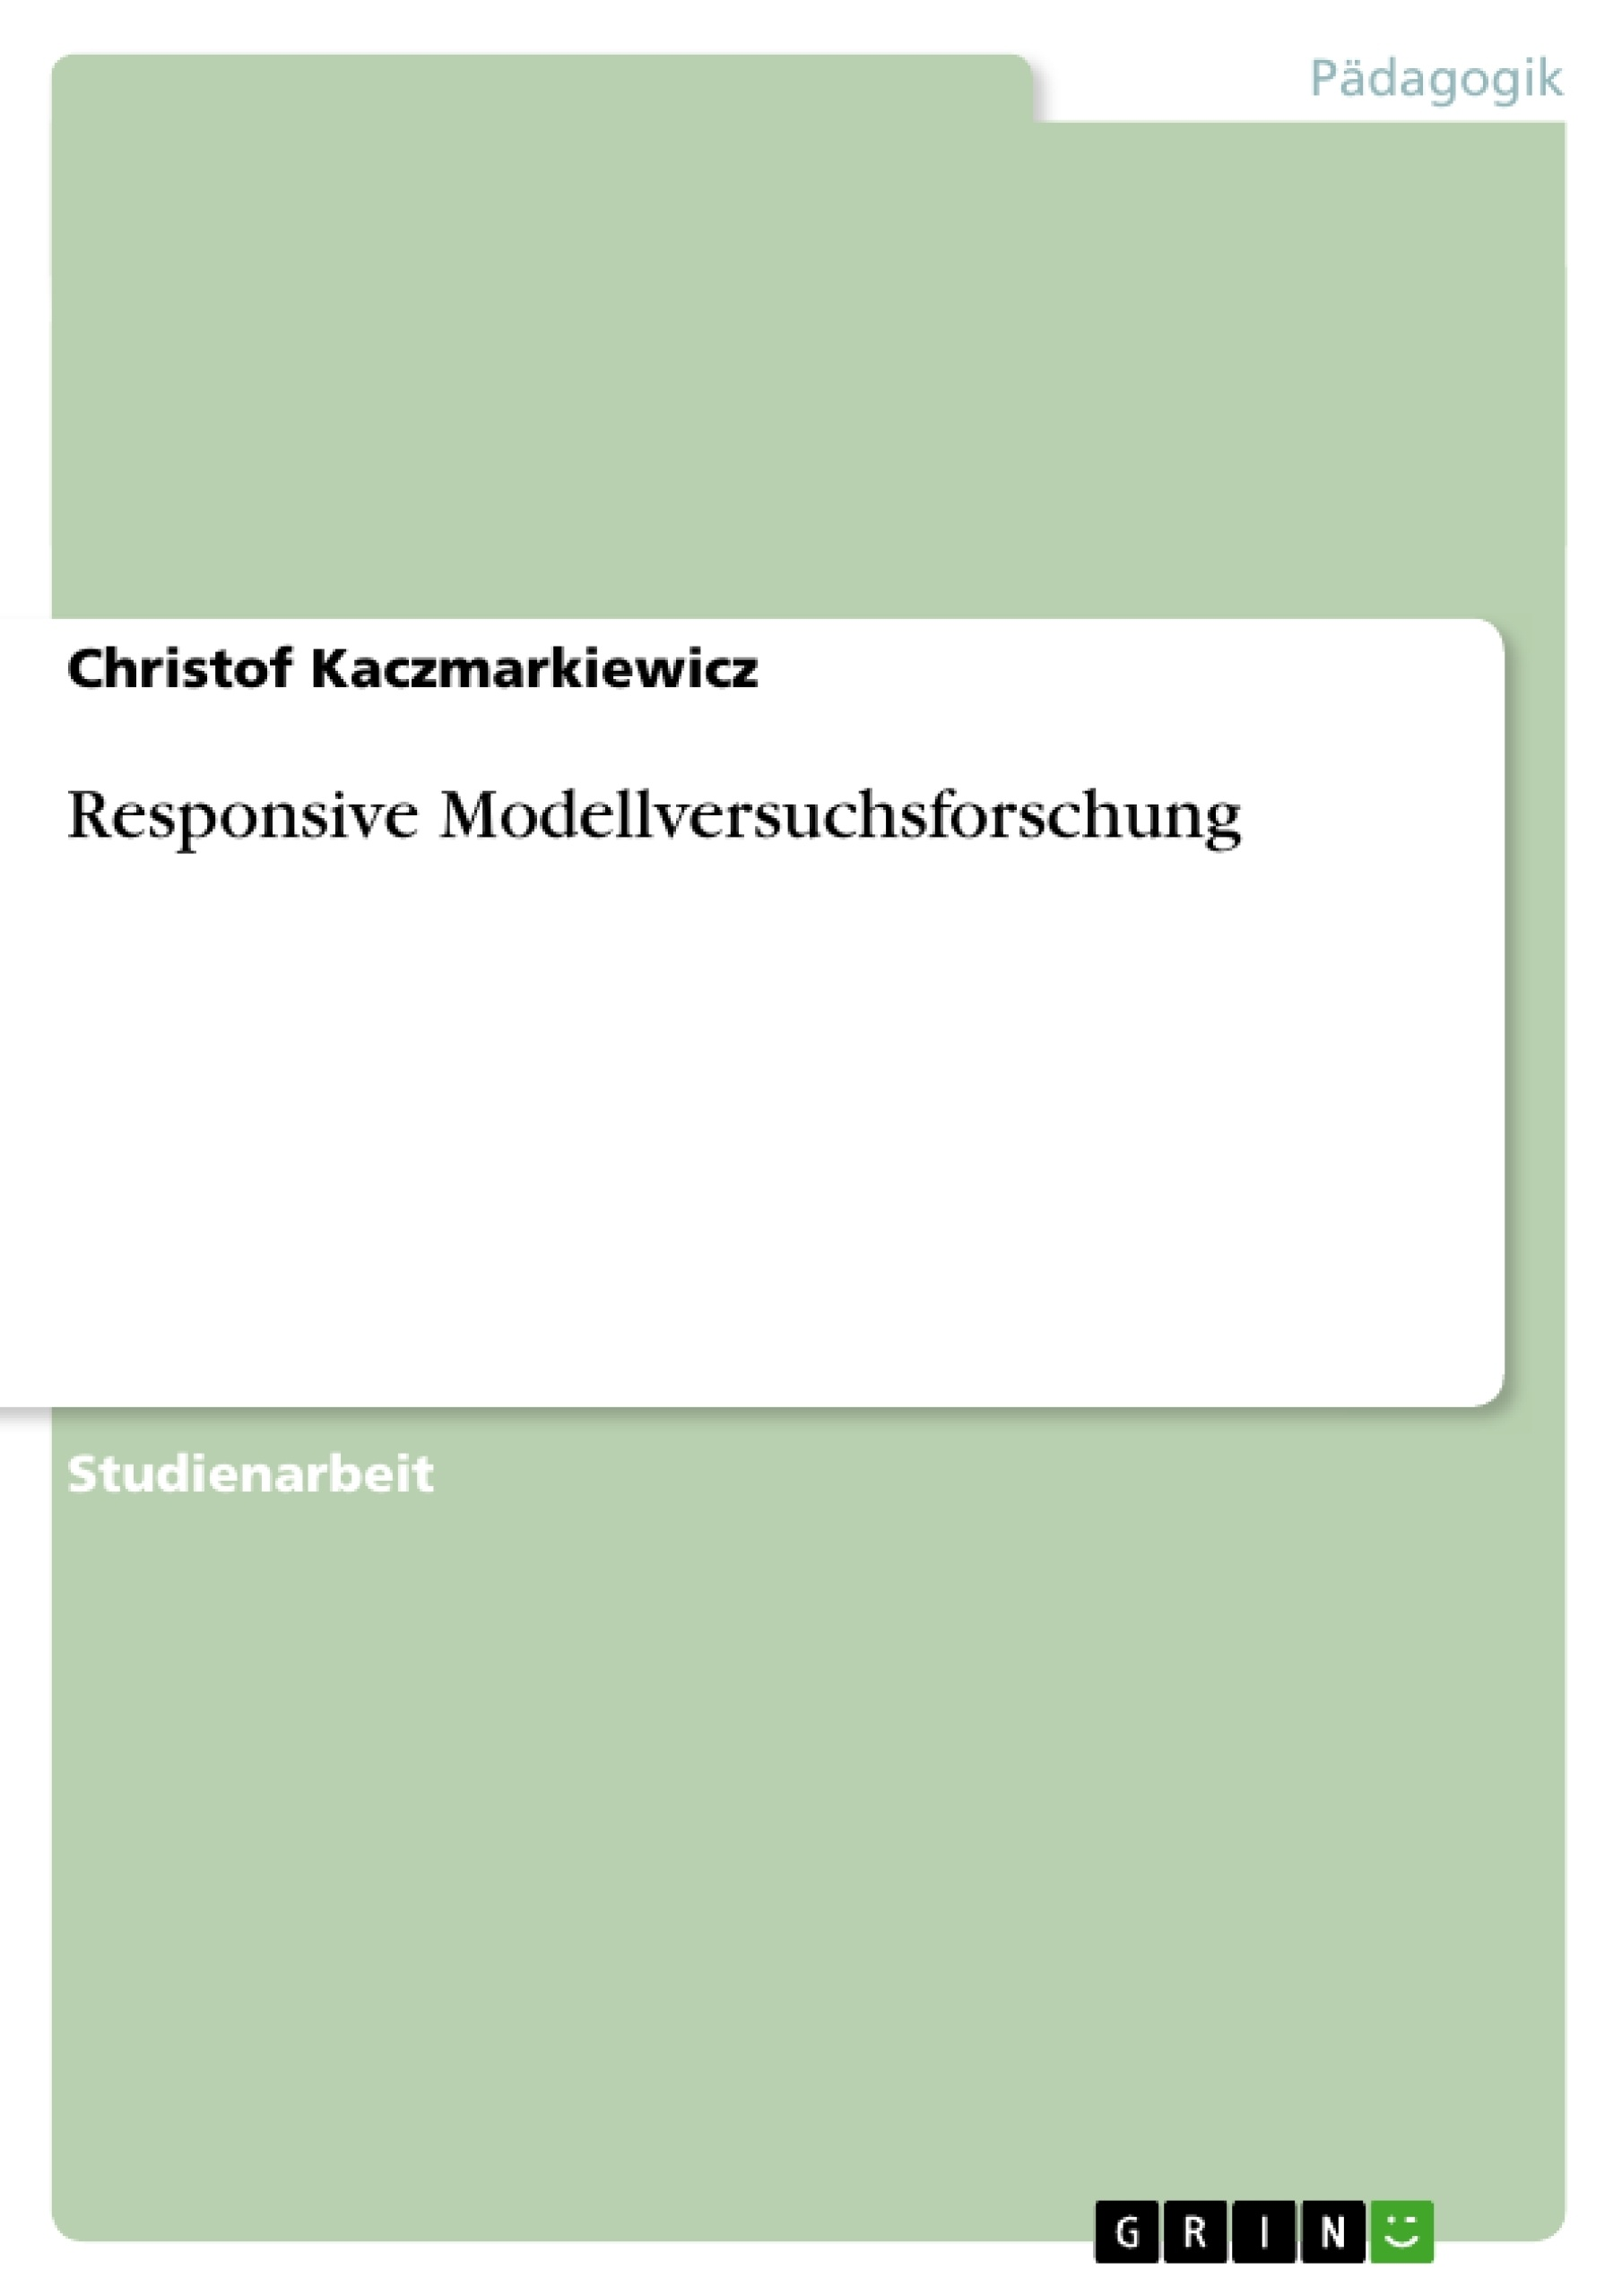 Titel: Responsive Modellversuchsforschung